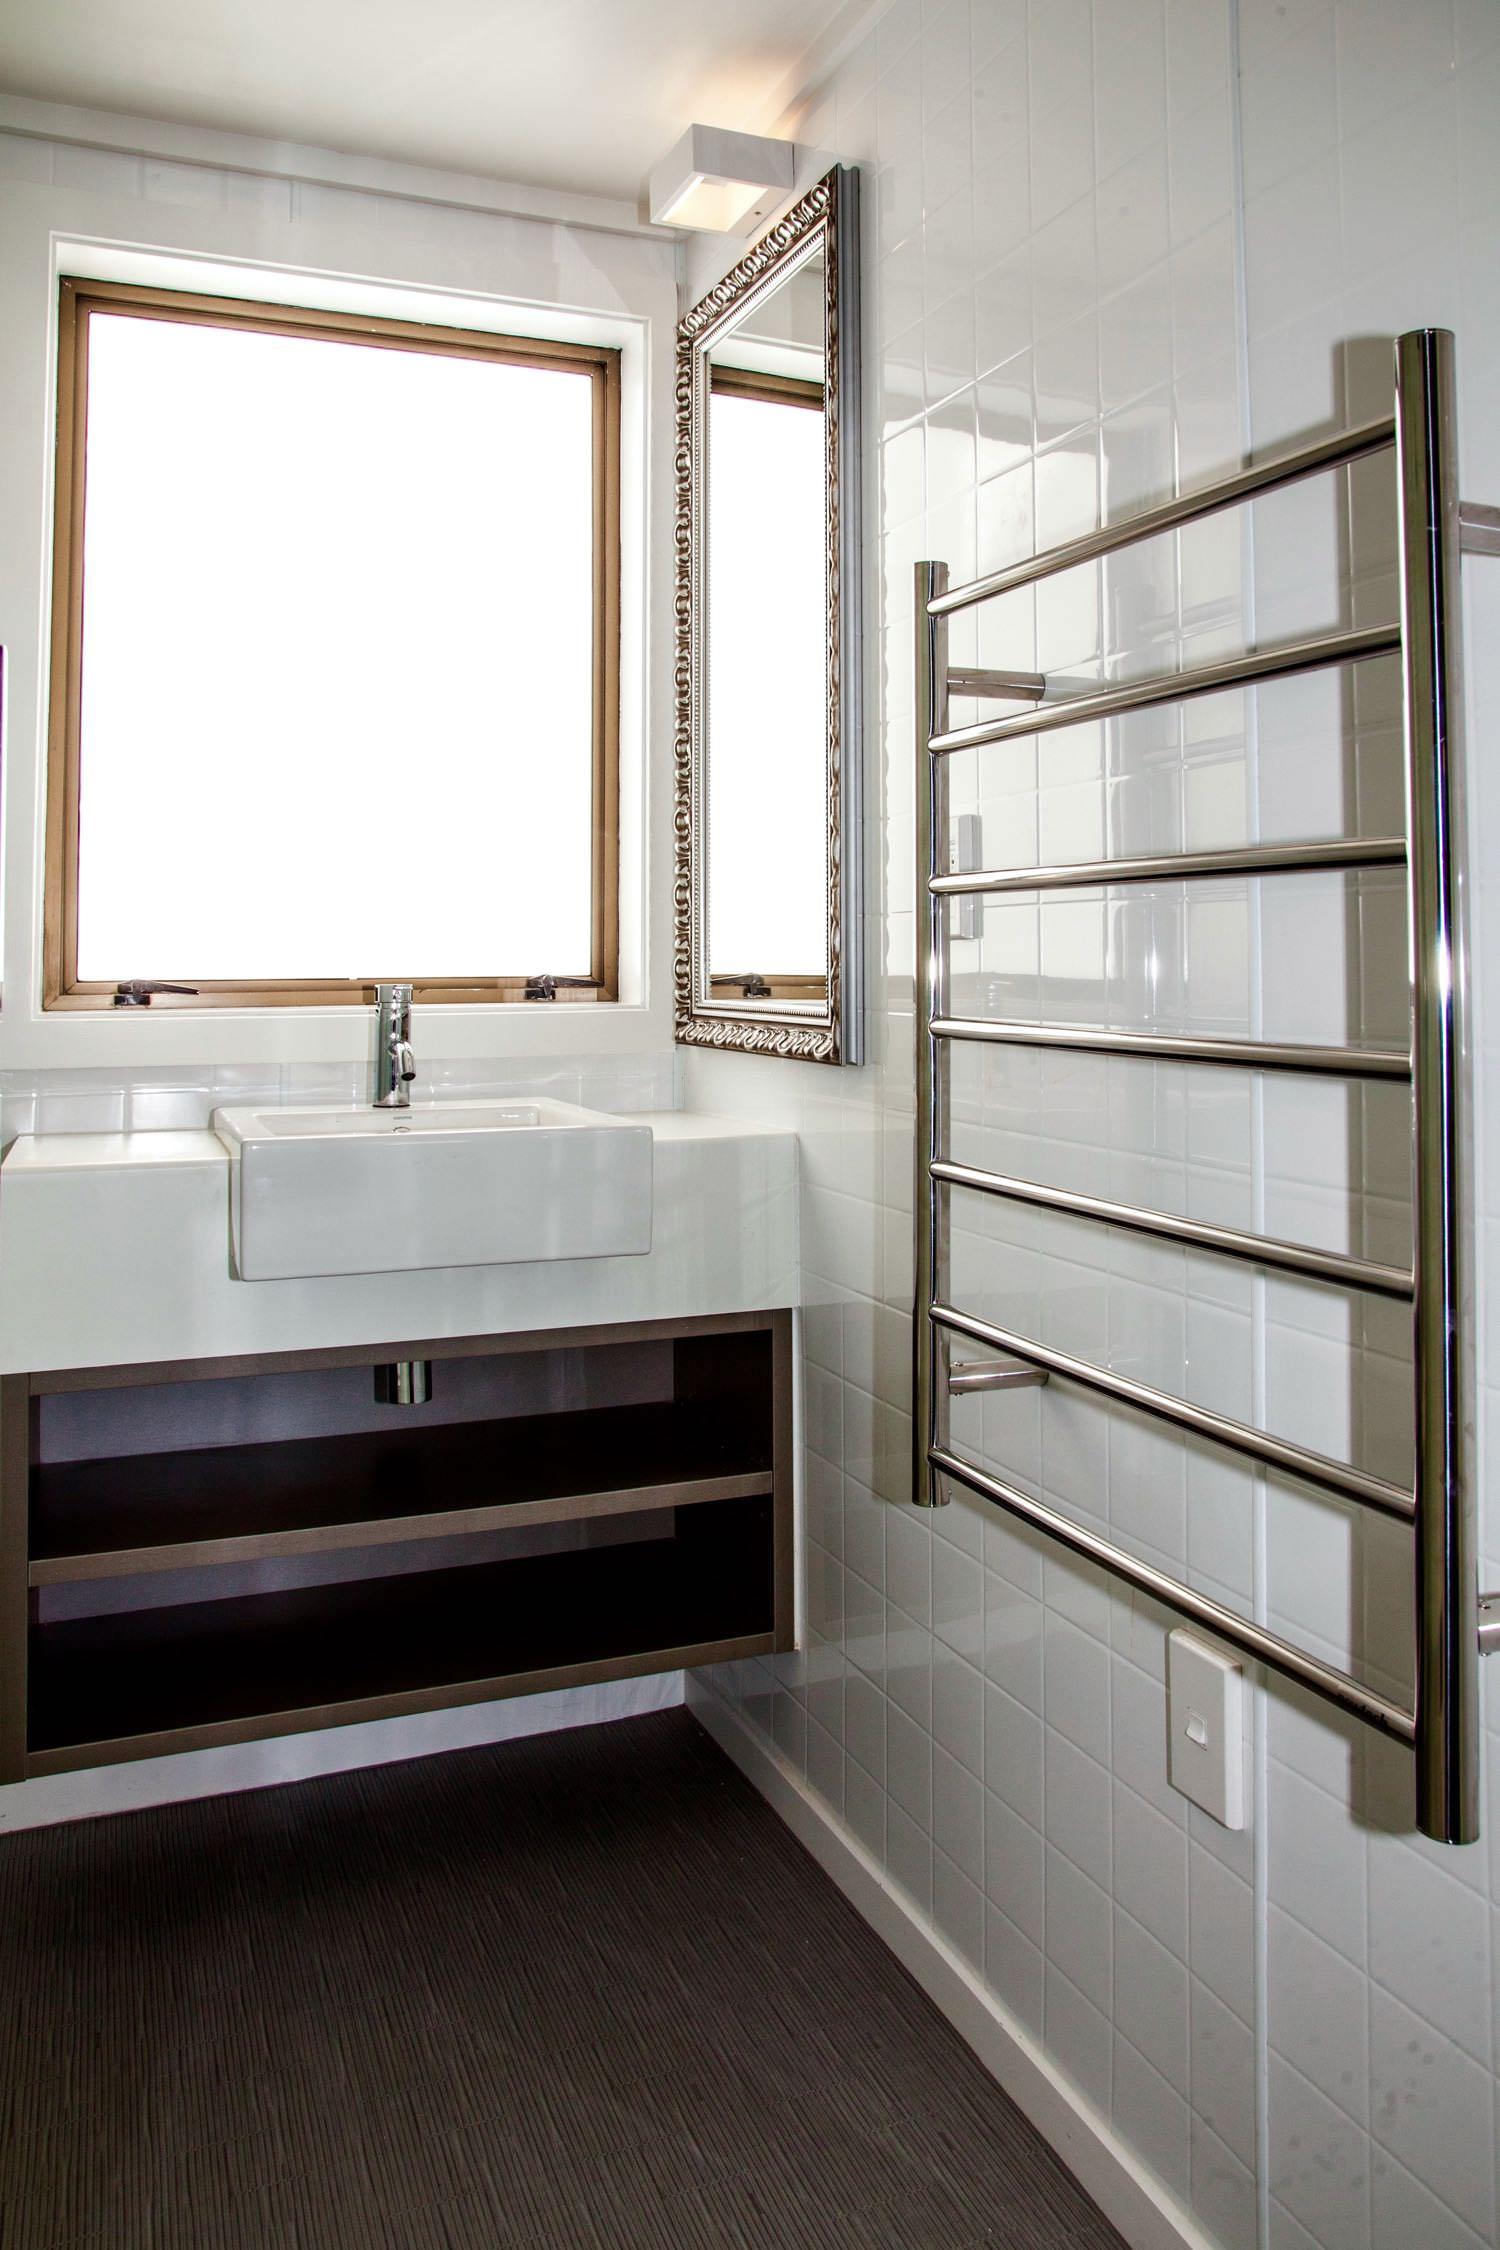 mezzanine - king bathroom